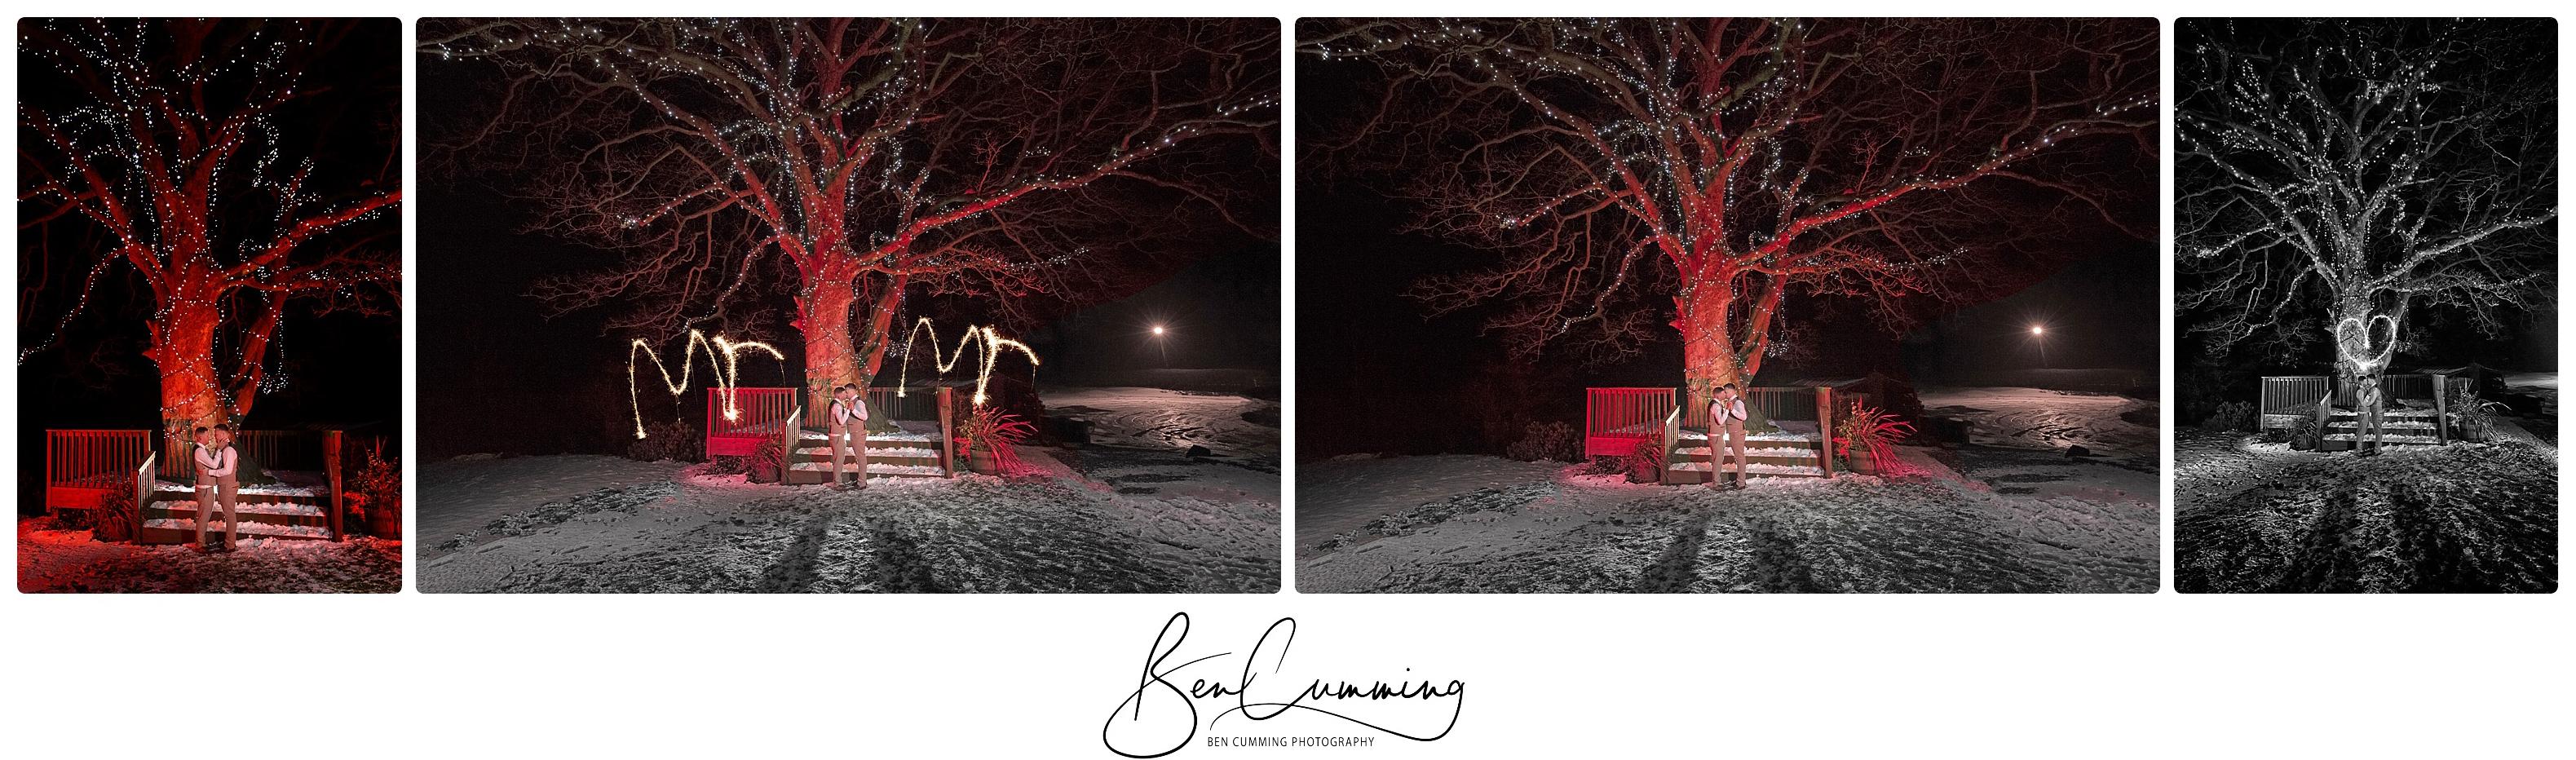 The Wedding Tree Stirk House Ben Cumming Photography